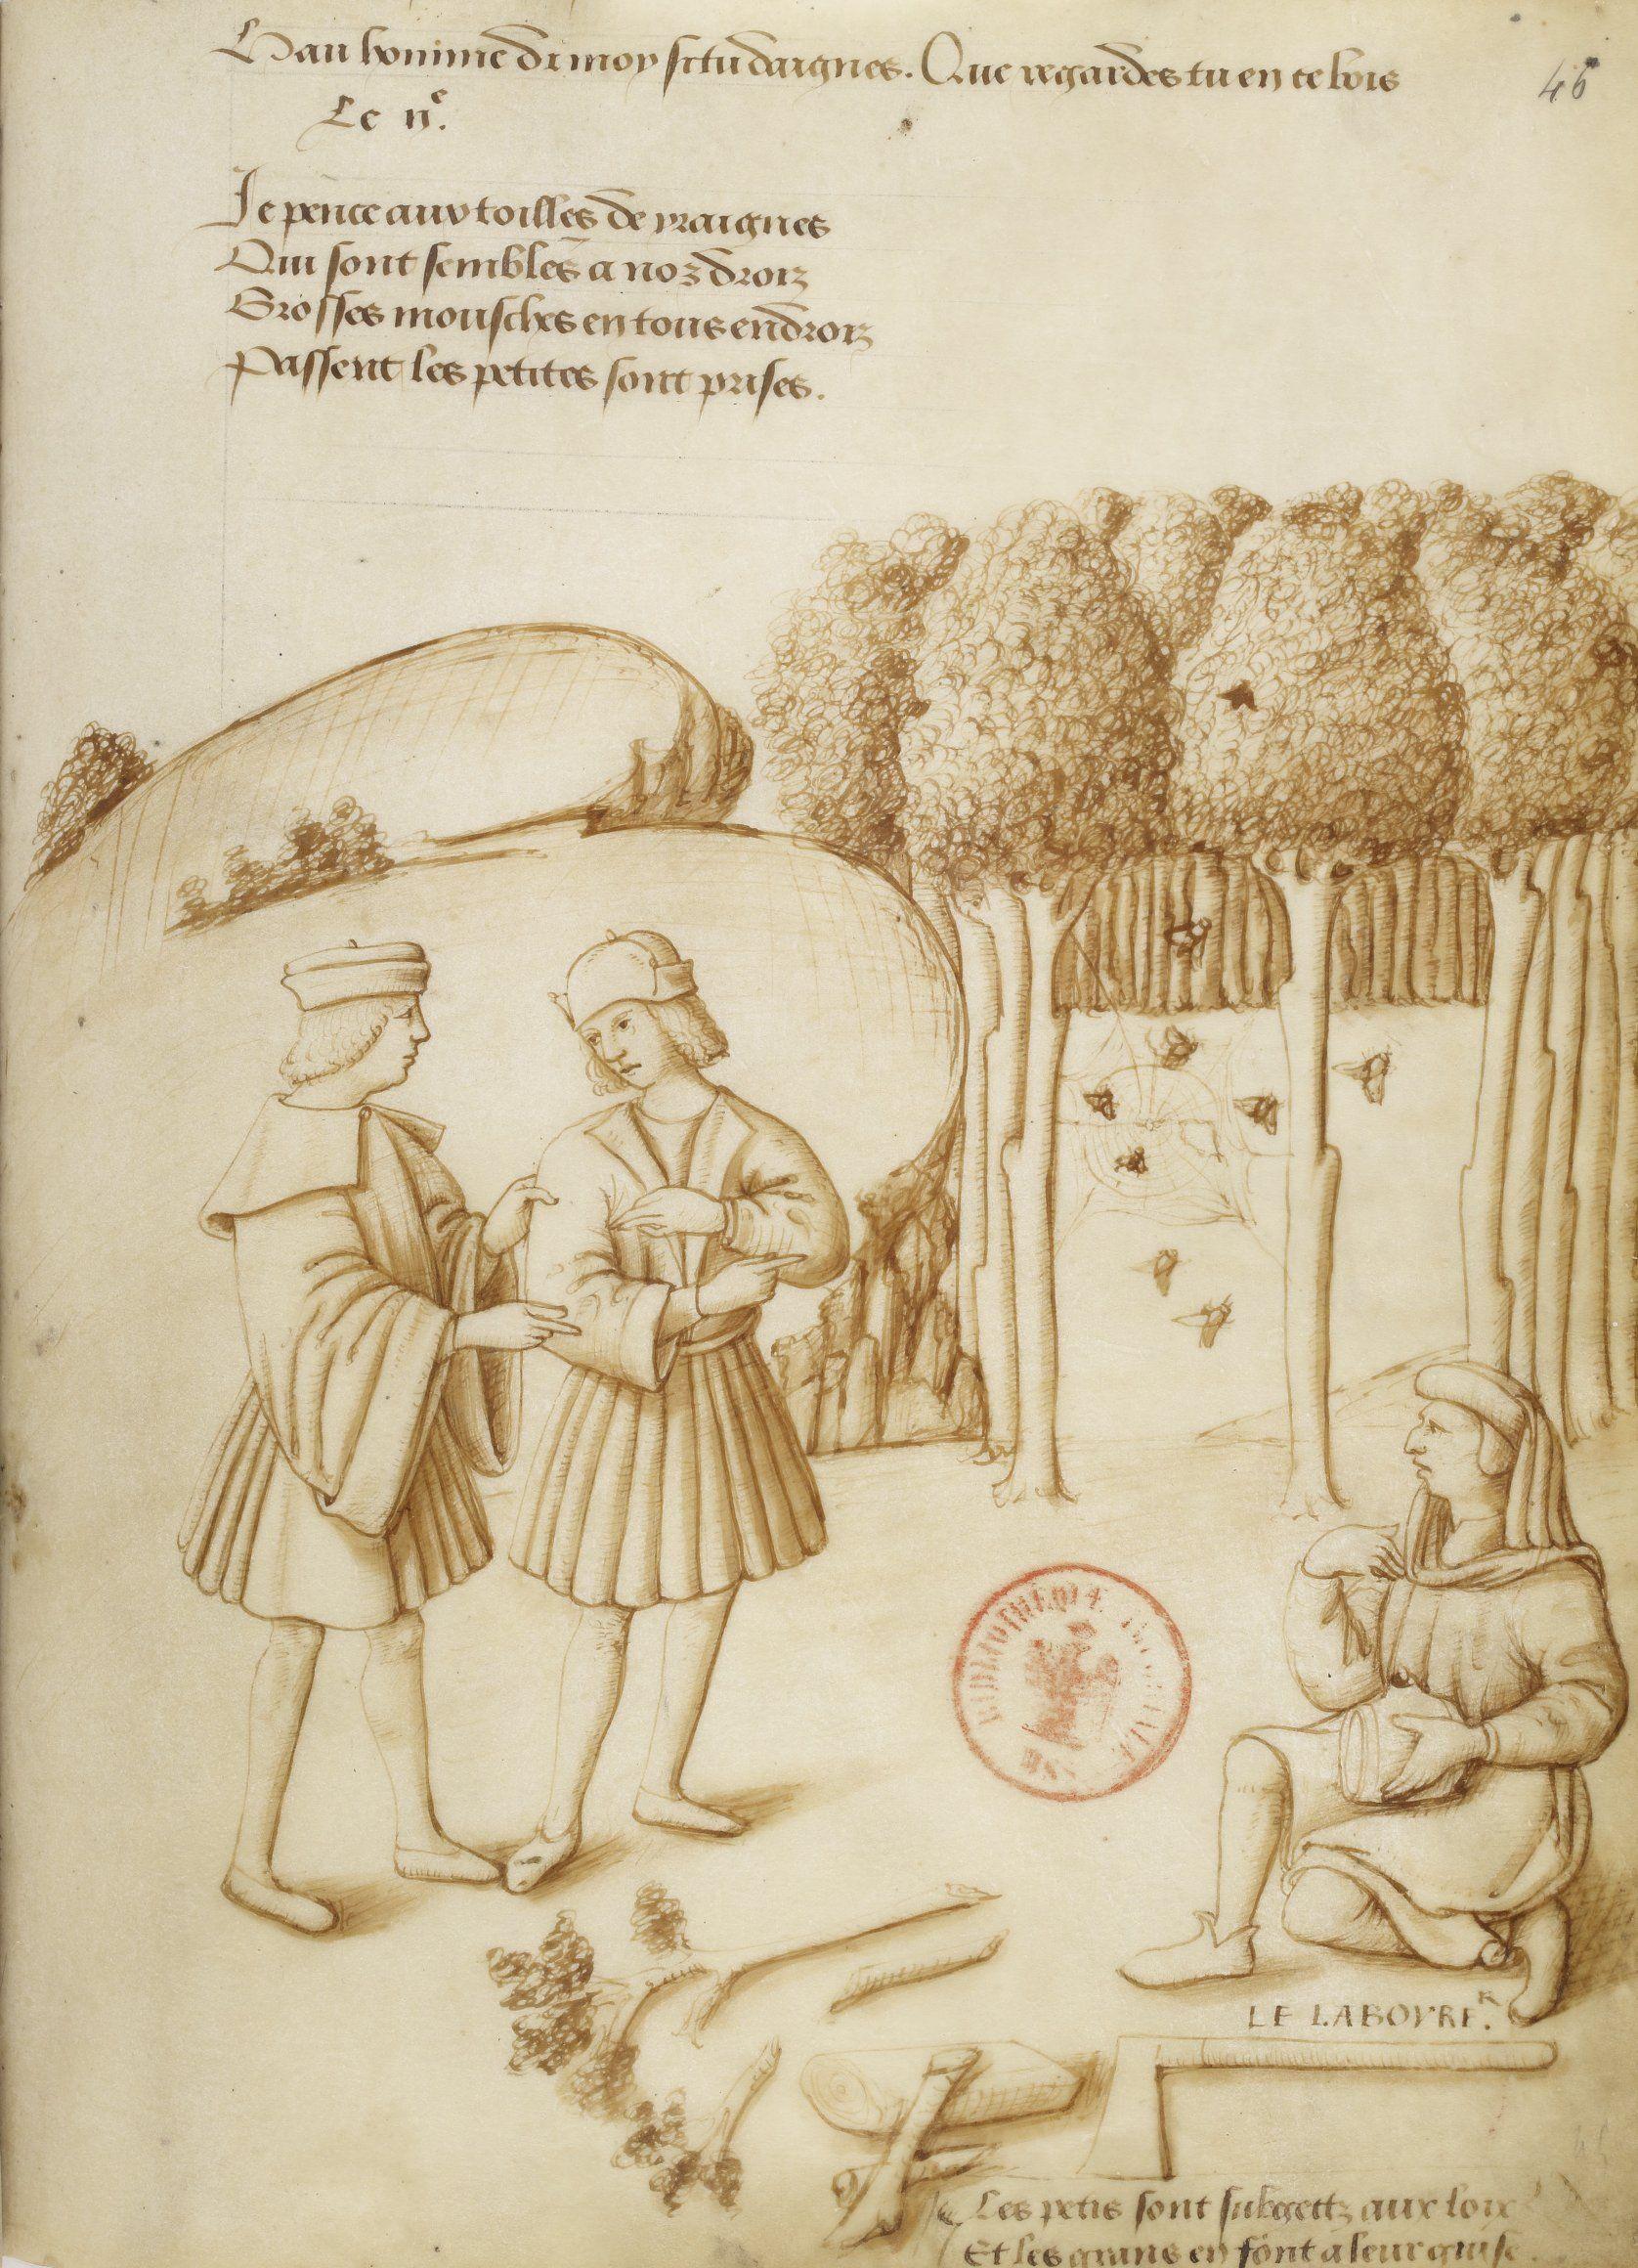 http://gallica.bnf.fr/ark:/12148/btv1b8426260f/f93.item